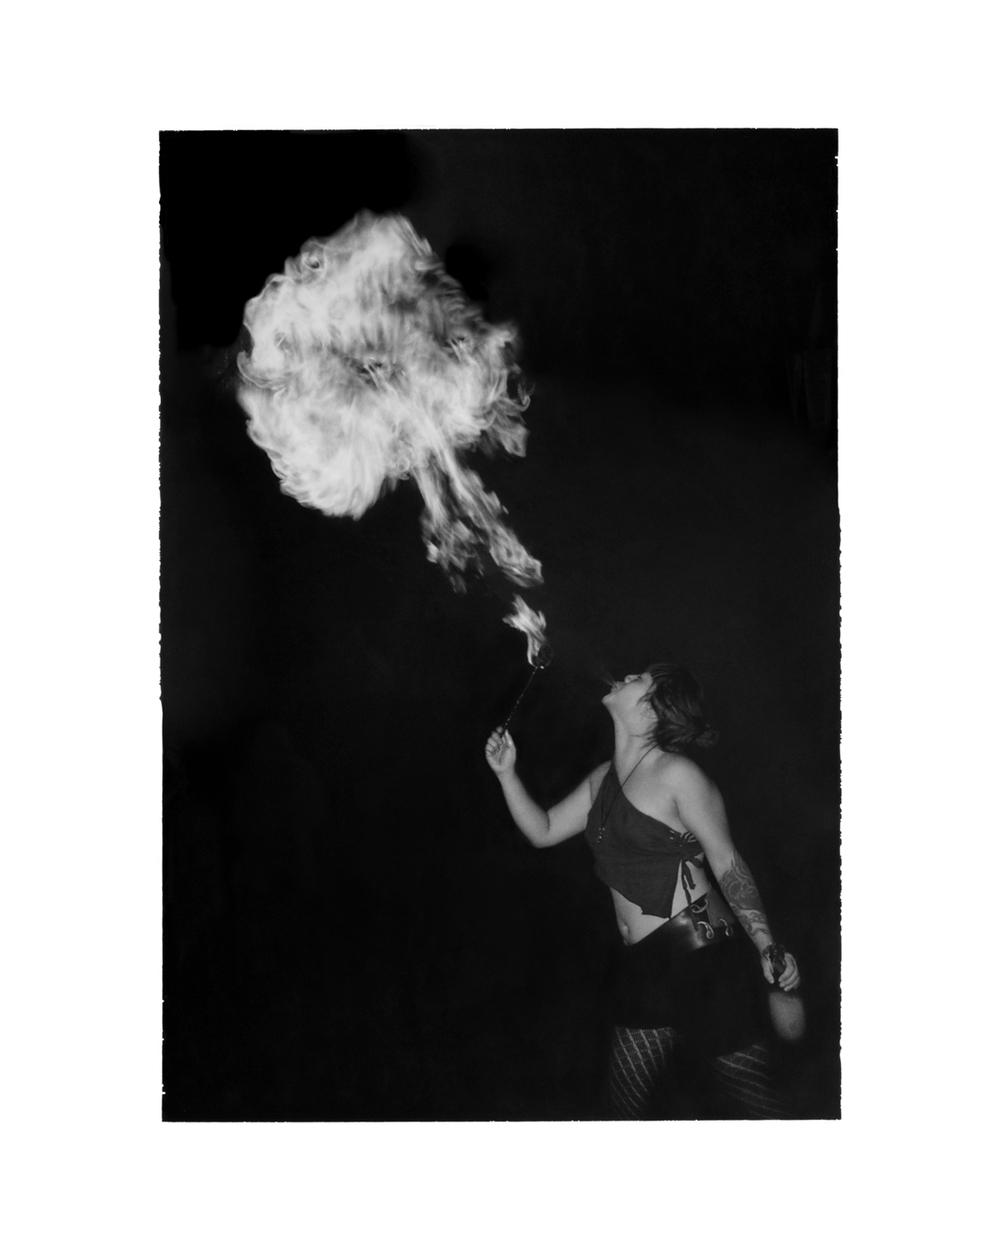 Sam Blows Fire